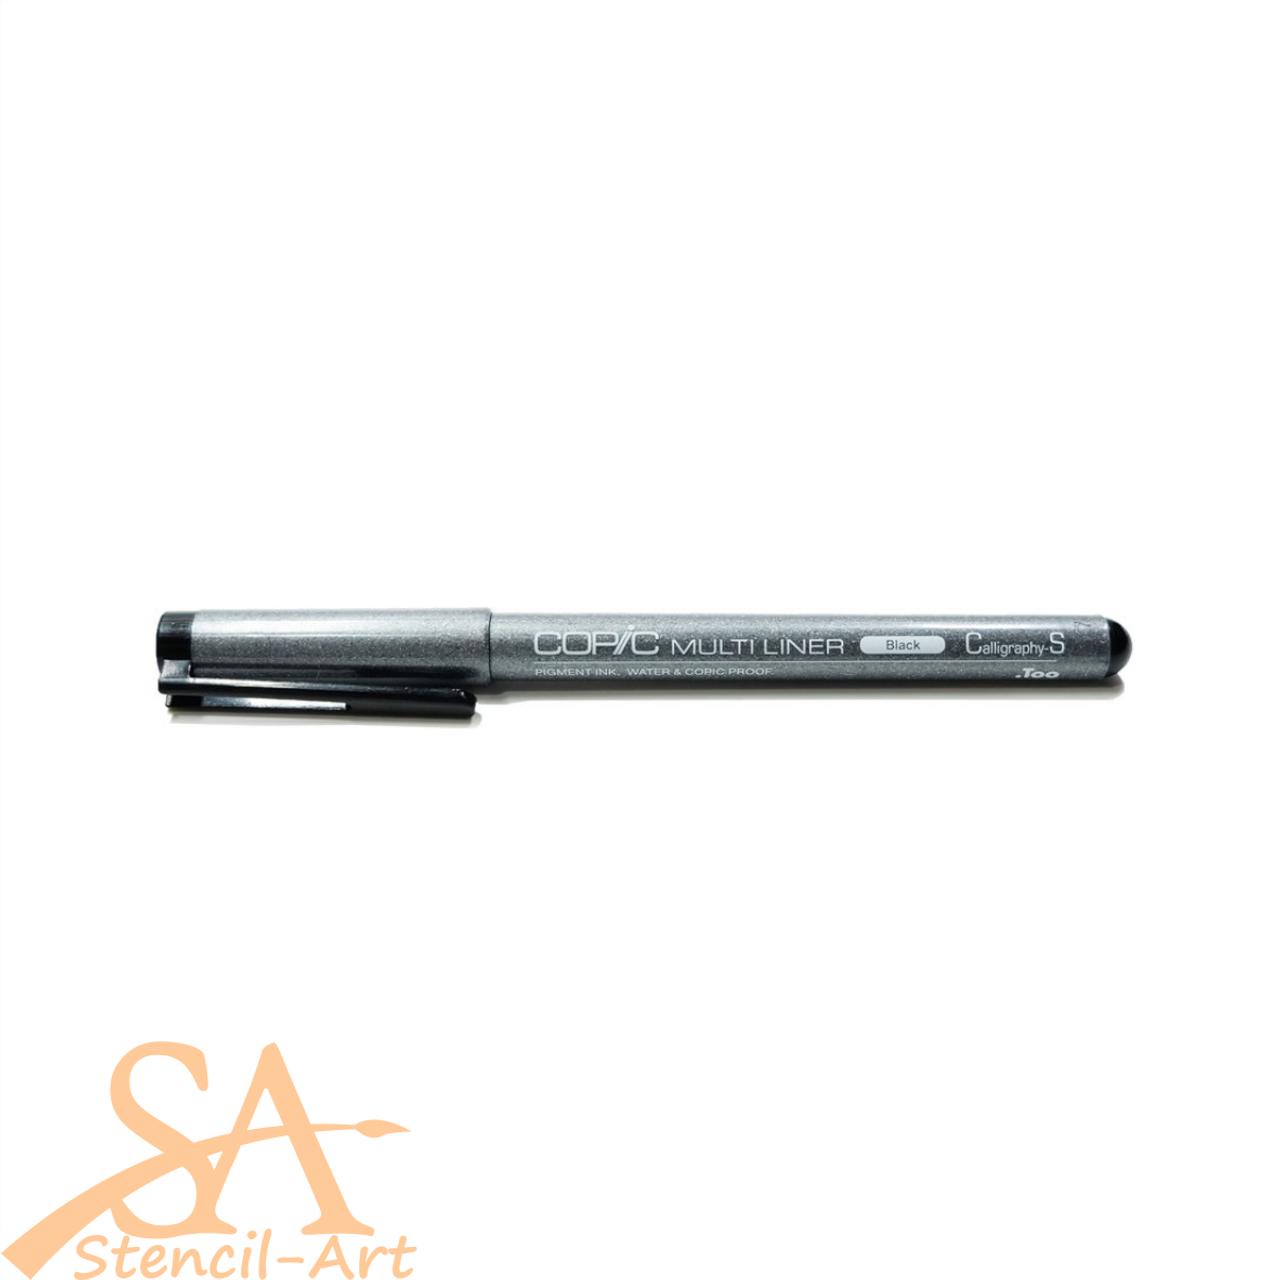 Copic Multiliner Pen Small Calligraphy (CS) Black